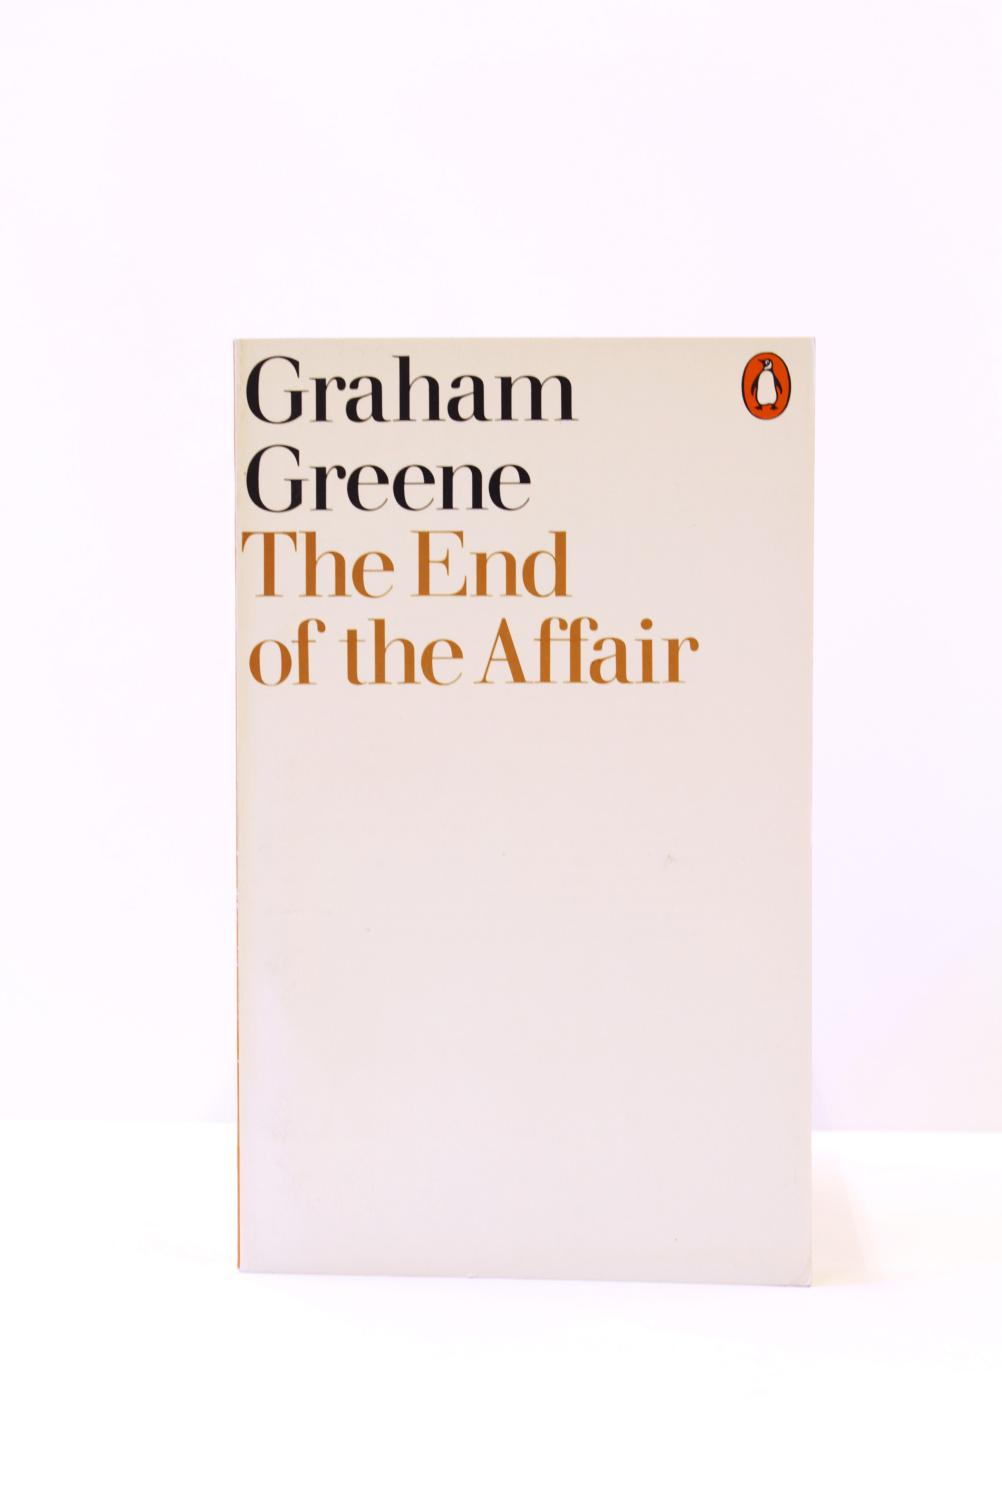 The End Of The Affair, Graham Greene